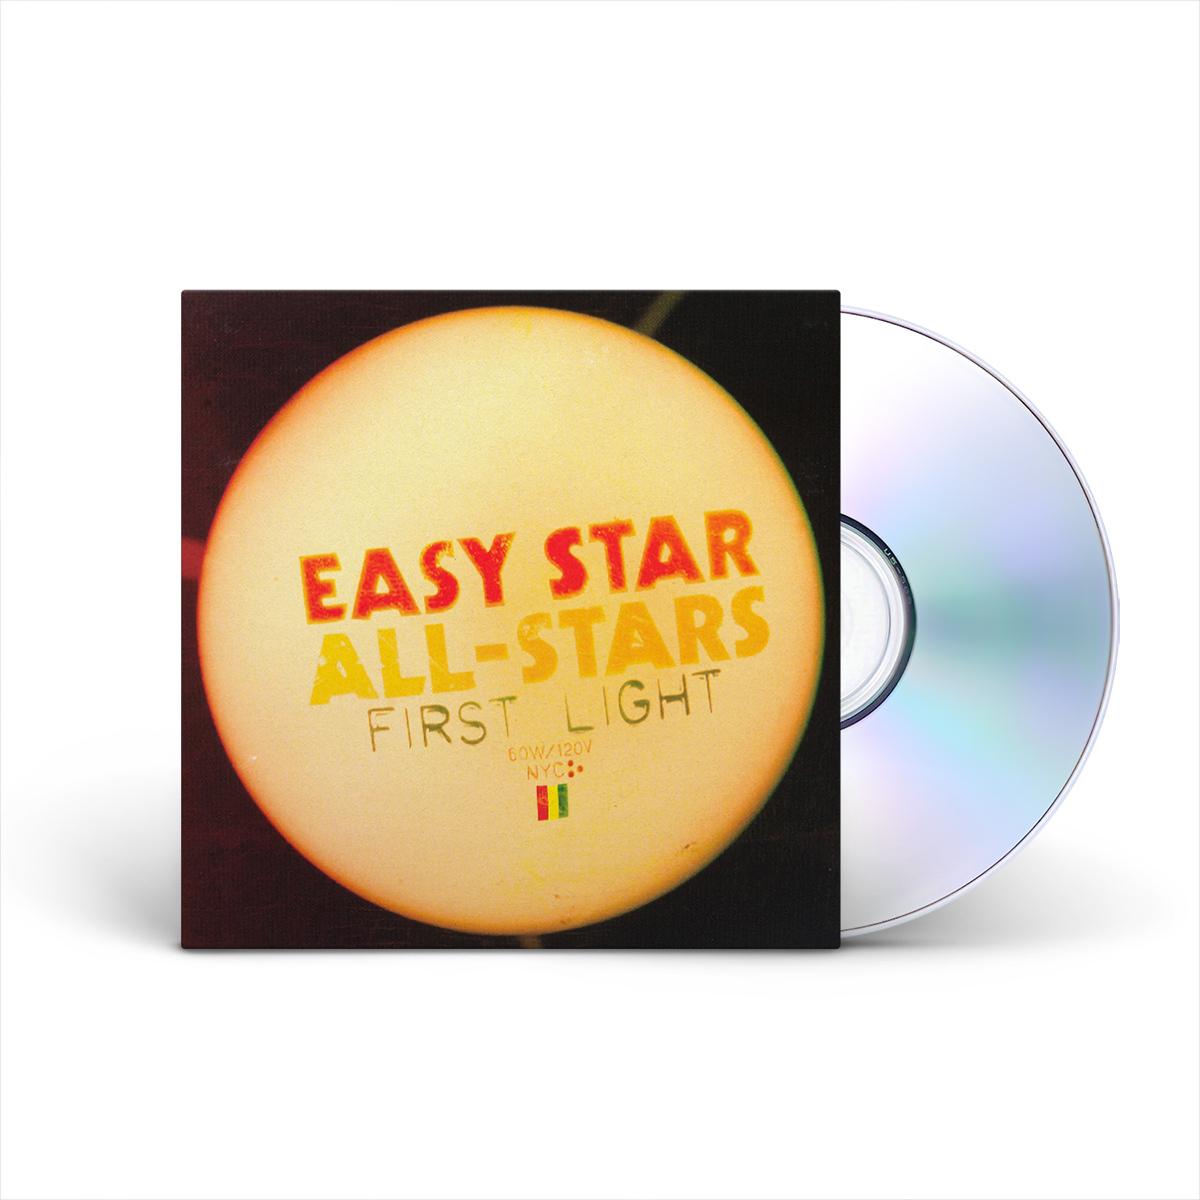 Easy Star All-Stars - First Light CD